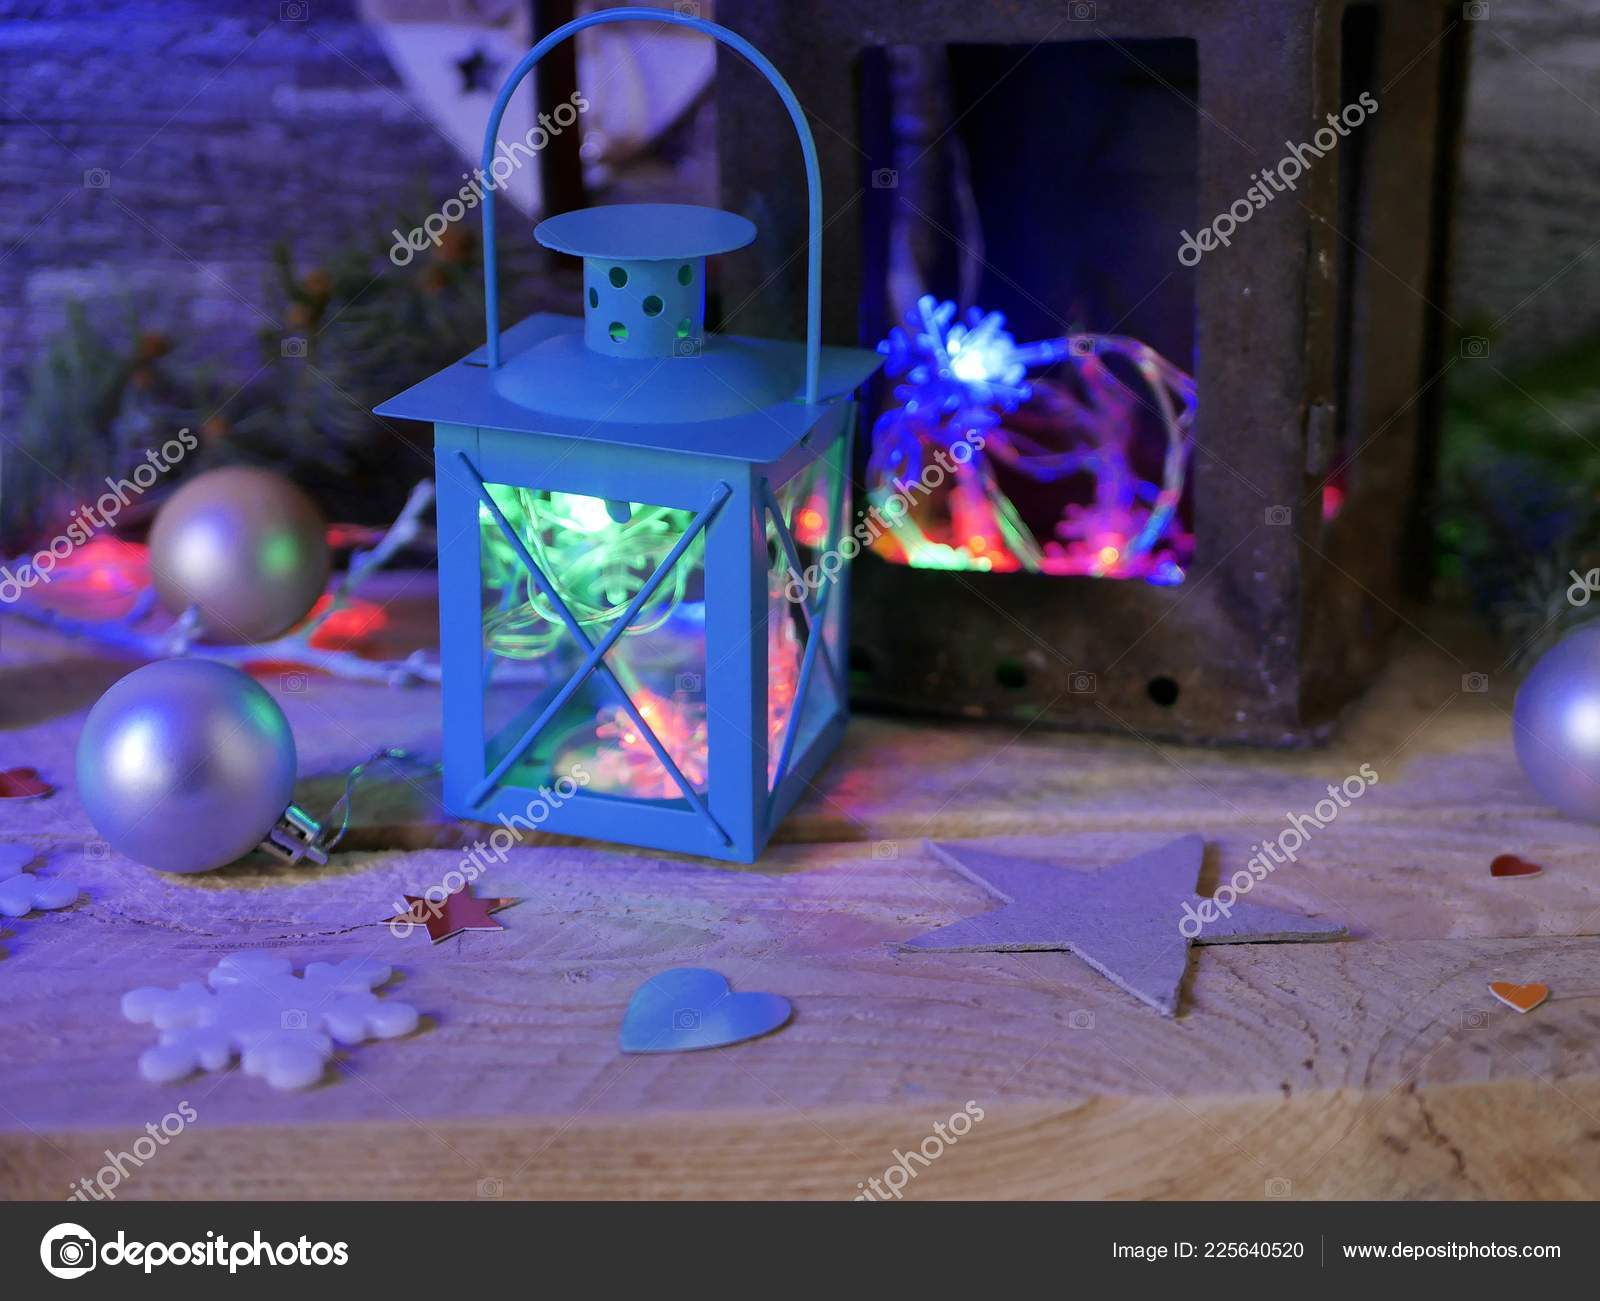 Seasonal Composition Christmas Decor Decorative Lanterns Christmas Tree Illumination Wooden Stock Photo C Tasha28 225640520